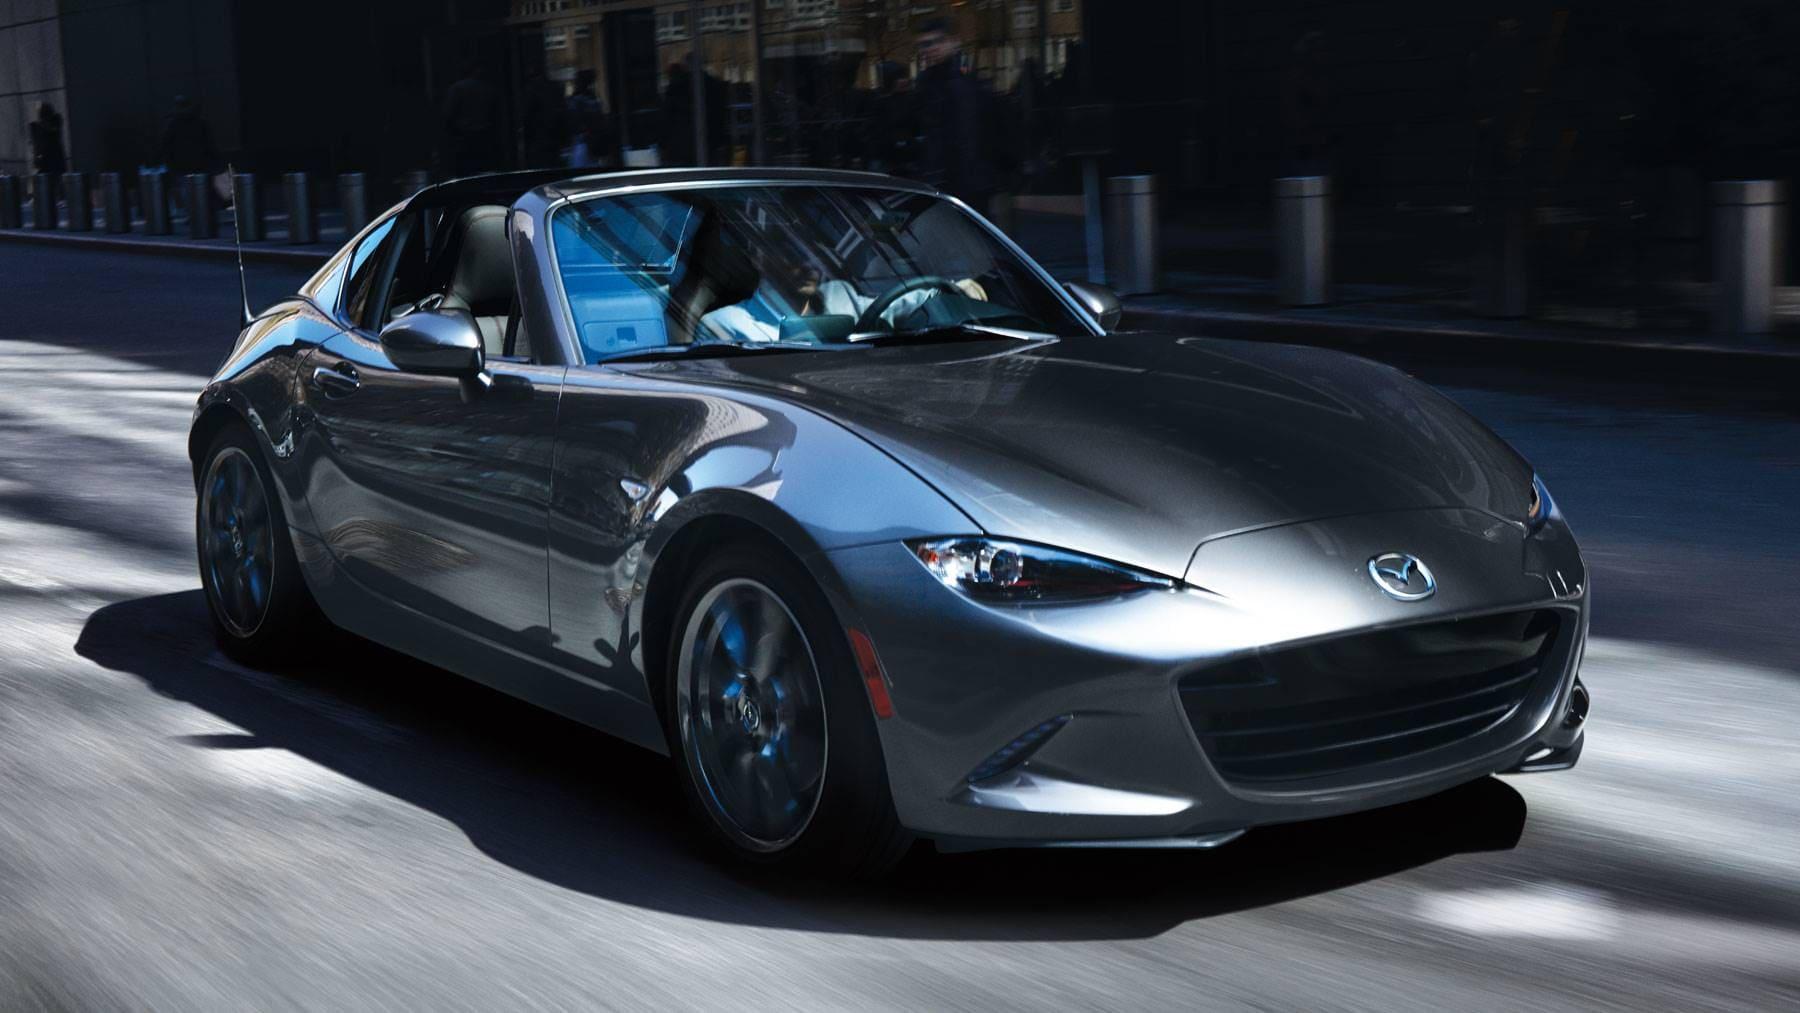 2019 Mazda MX5 Miata RF Bergen County NJ